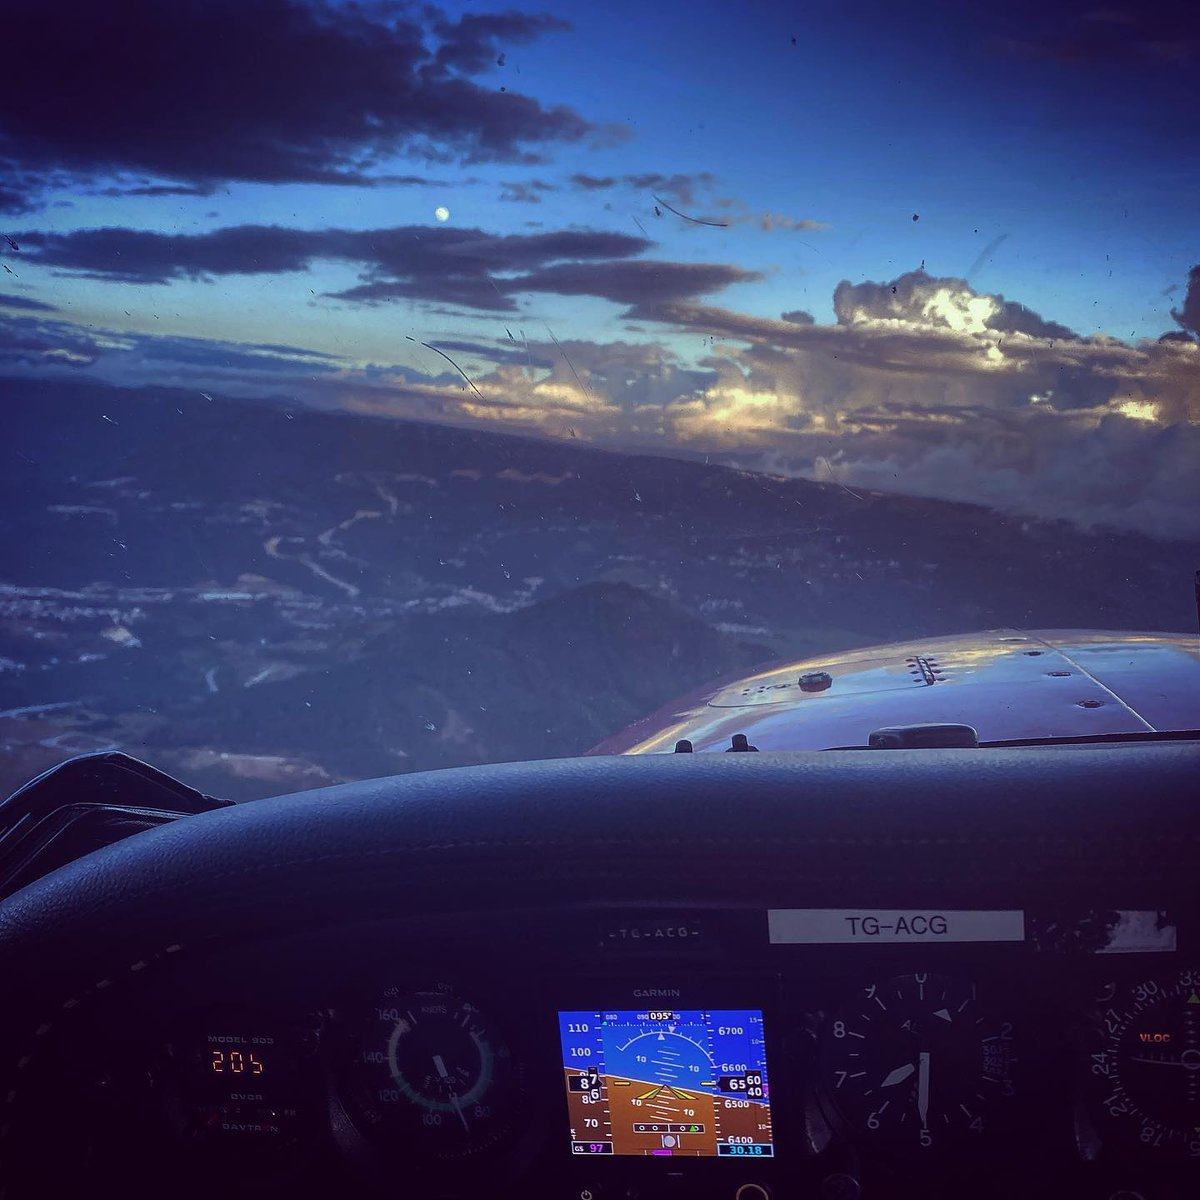 Listos para el fin de semana 😍✈️  #aviationphotography #avgeek #aviacion #aviationlovers #aviation